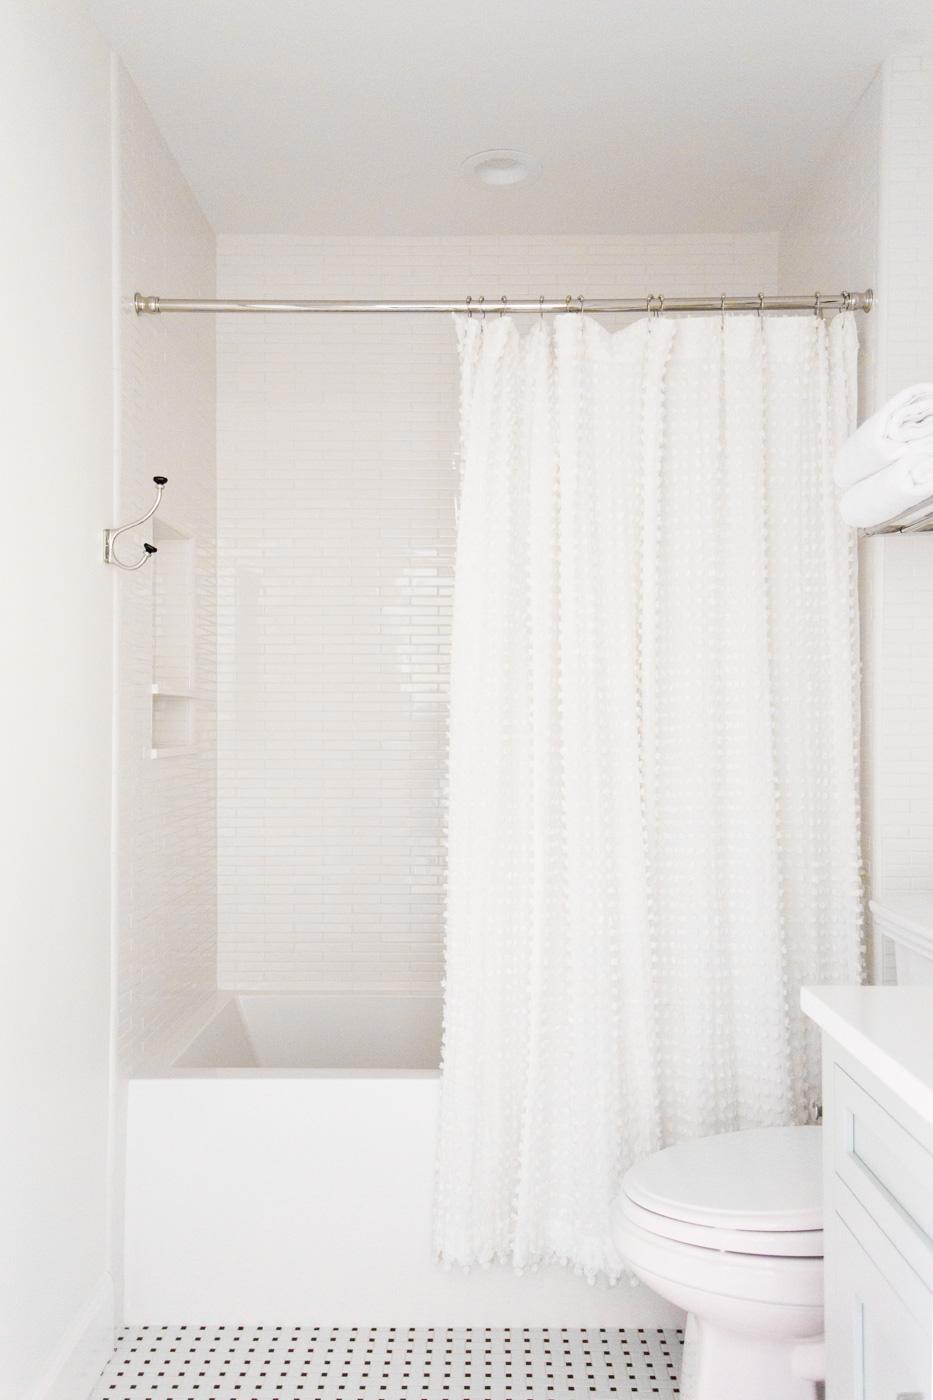 Black/white tile and pom pom shower curtain || Studio McGee